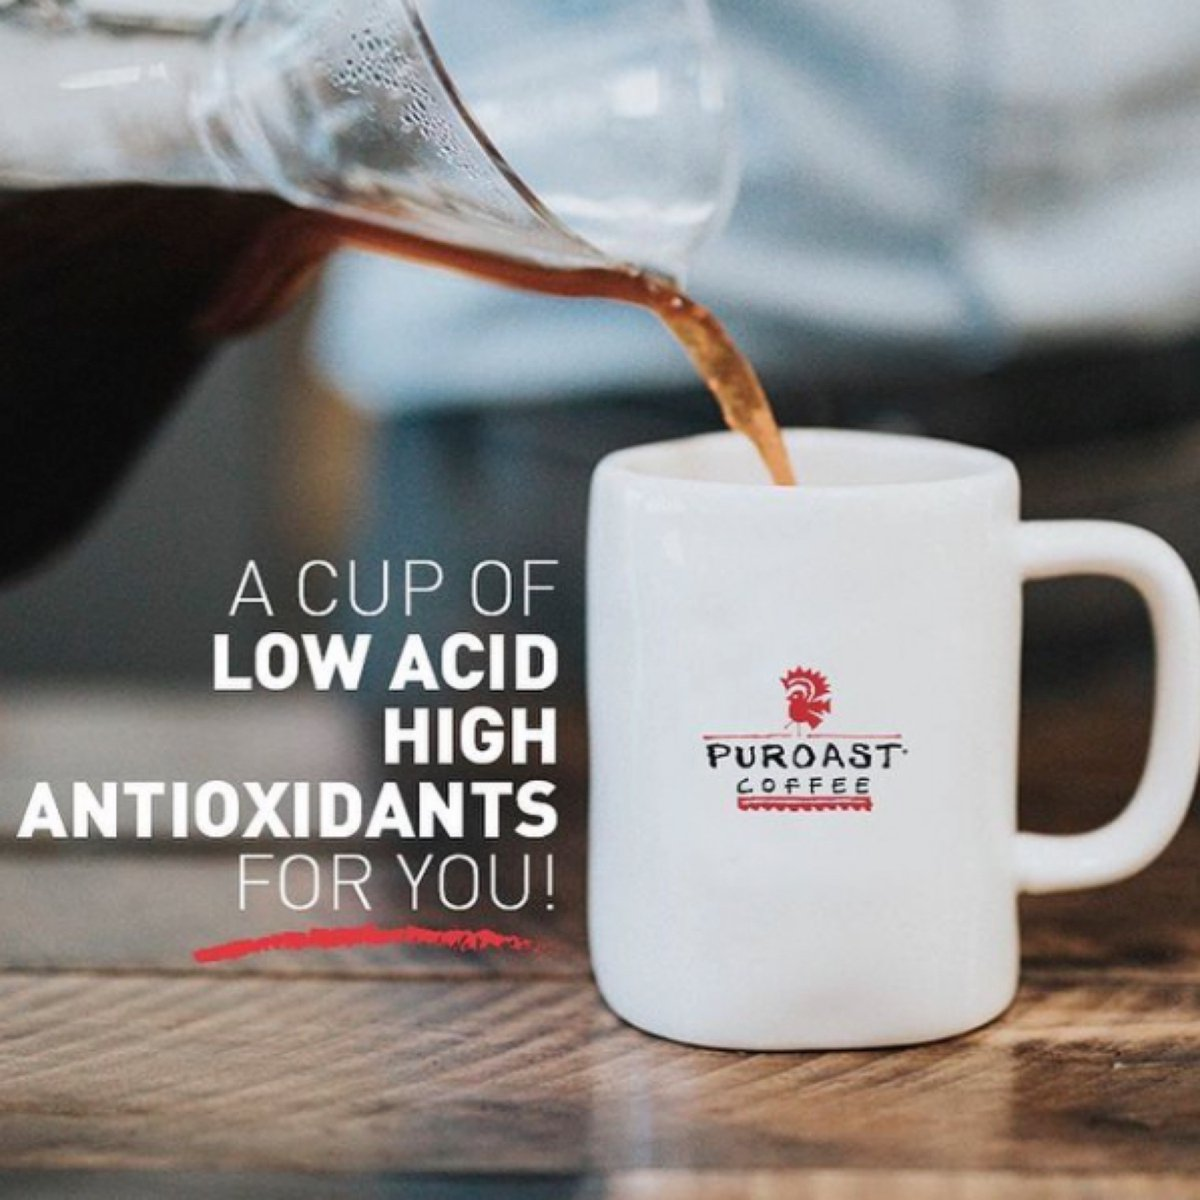 Discover the #wellness that will keep you feeling fantastic & energized all day long!   #PuroastCoffee #health #healthy #coffeeaddict #coffeebreak #coffeeculture #coffeegeek #coffeelover #coffeemug #lowacidcoffee #coffeeoftheday #cascadiamanagingbrands